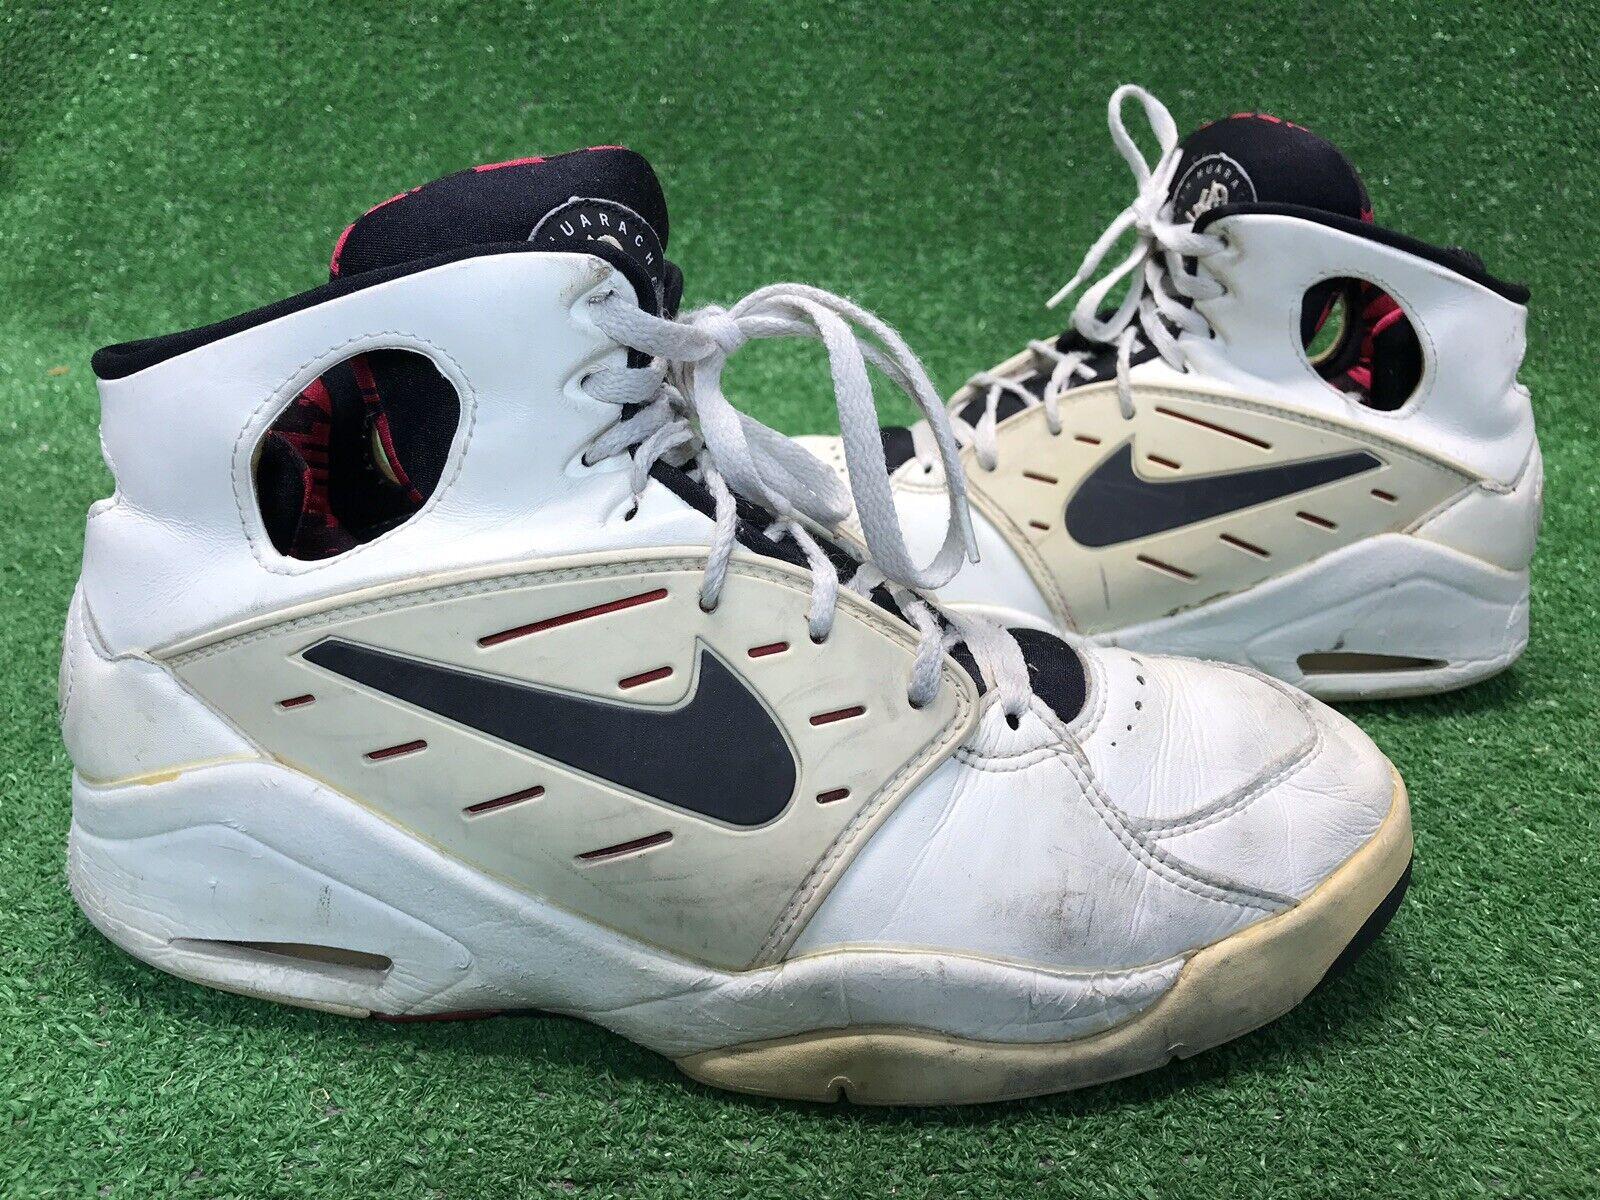 True Vintage NIKE Air Huarache Flight Men's Sneakers shoes White Men's 13 Rare